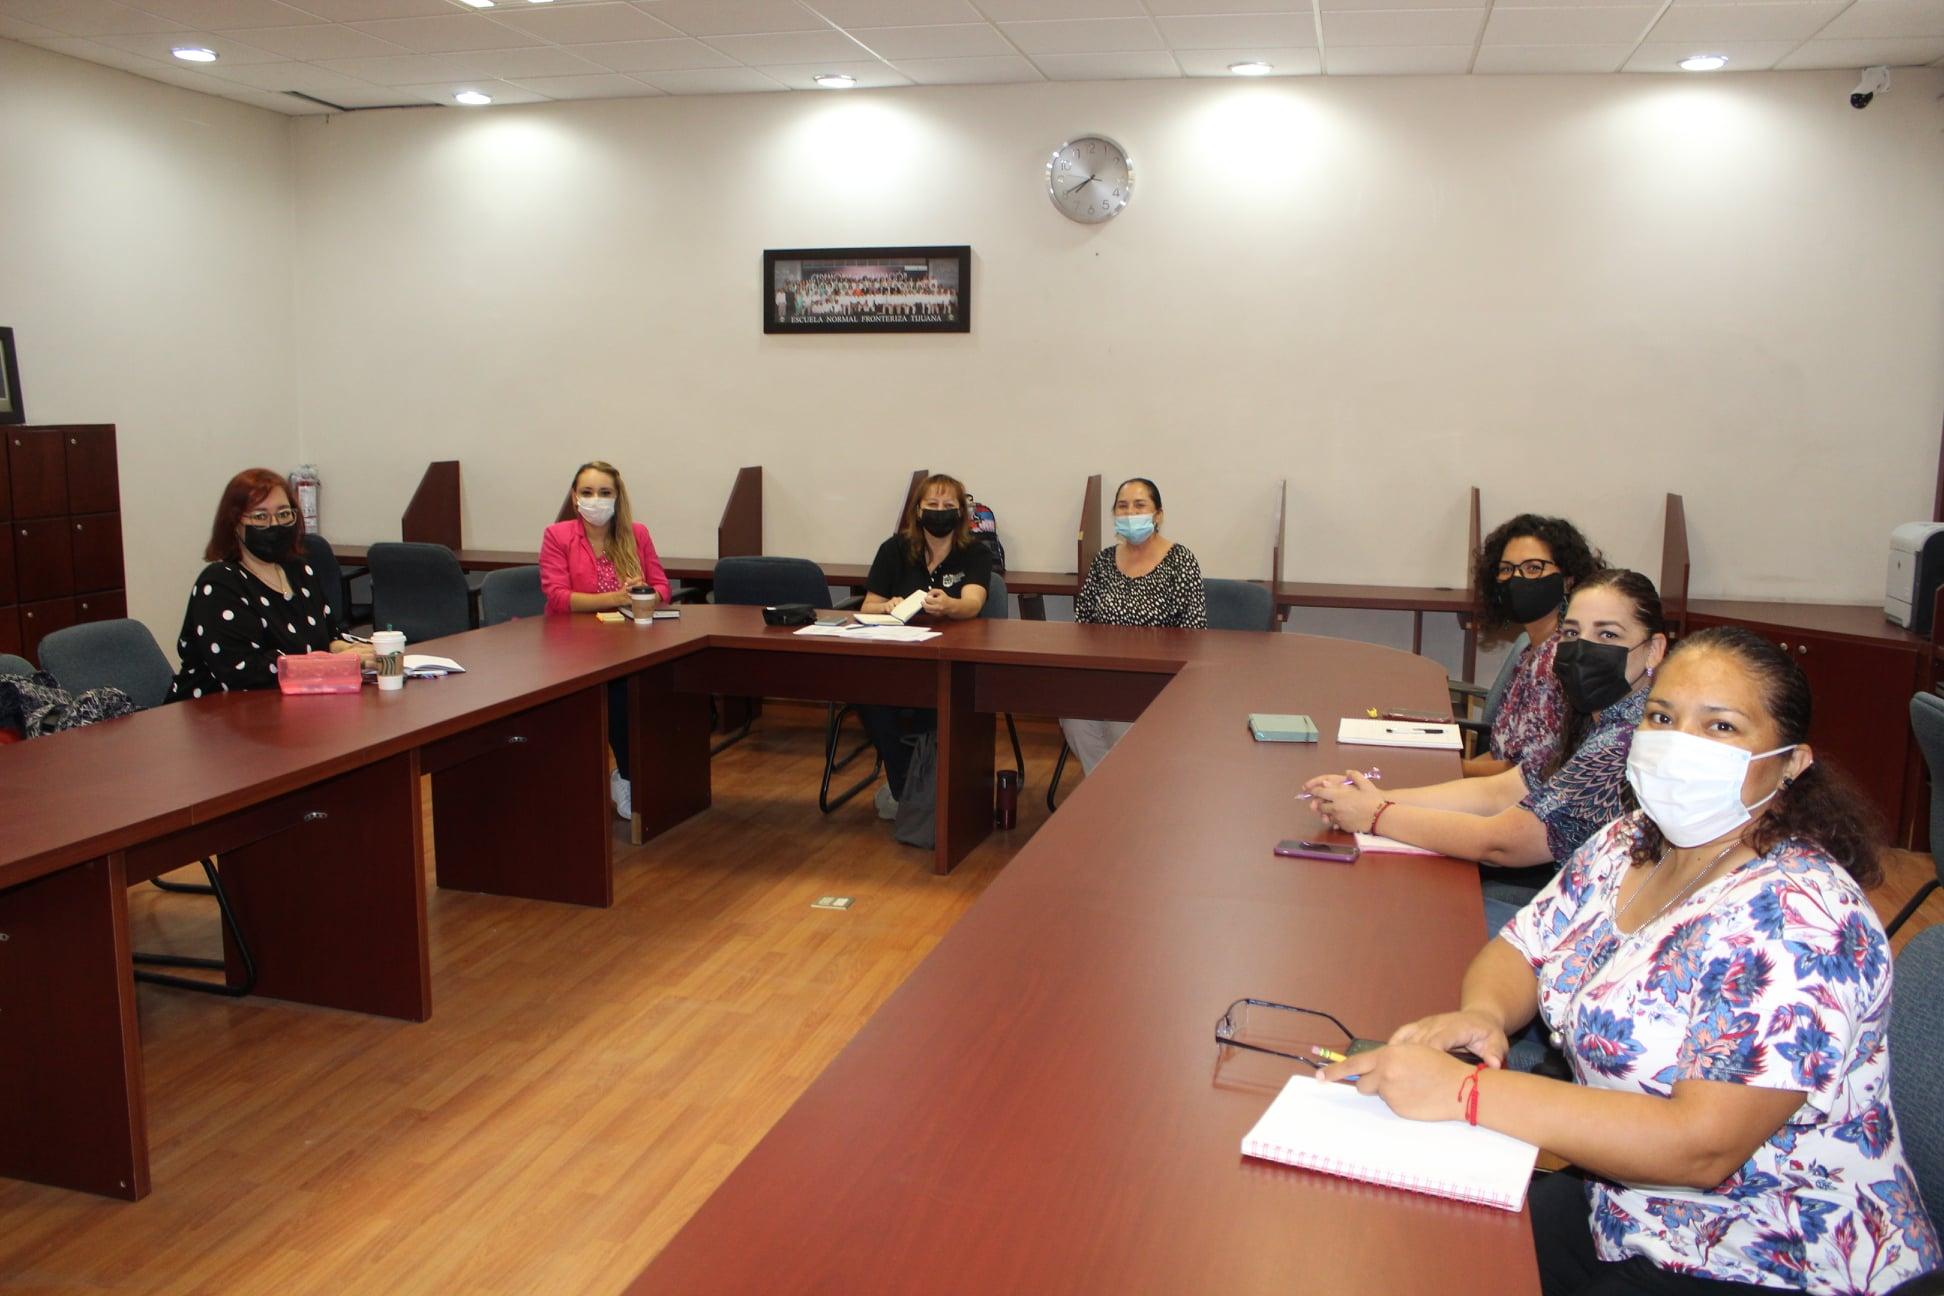 Se reunen coordinadoras de licenciaturas con equipo directivo.